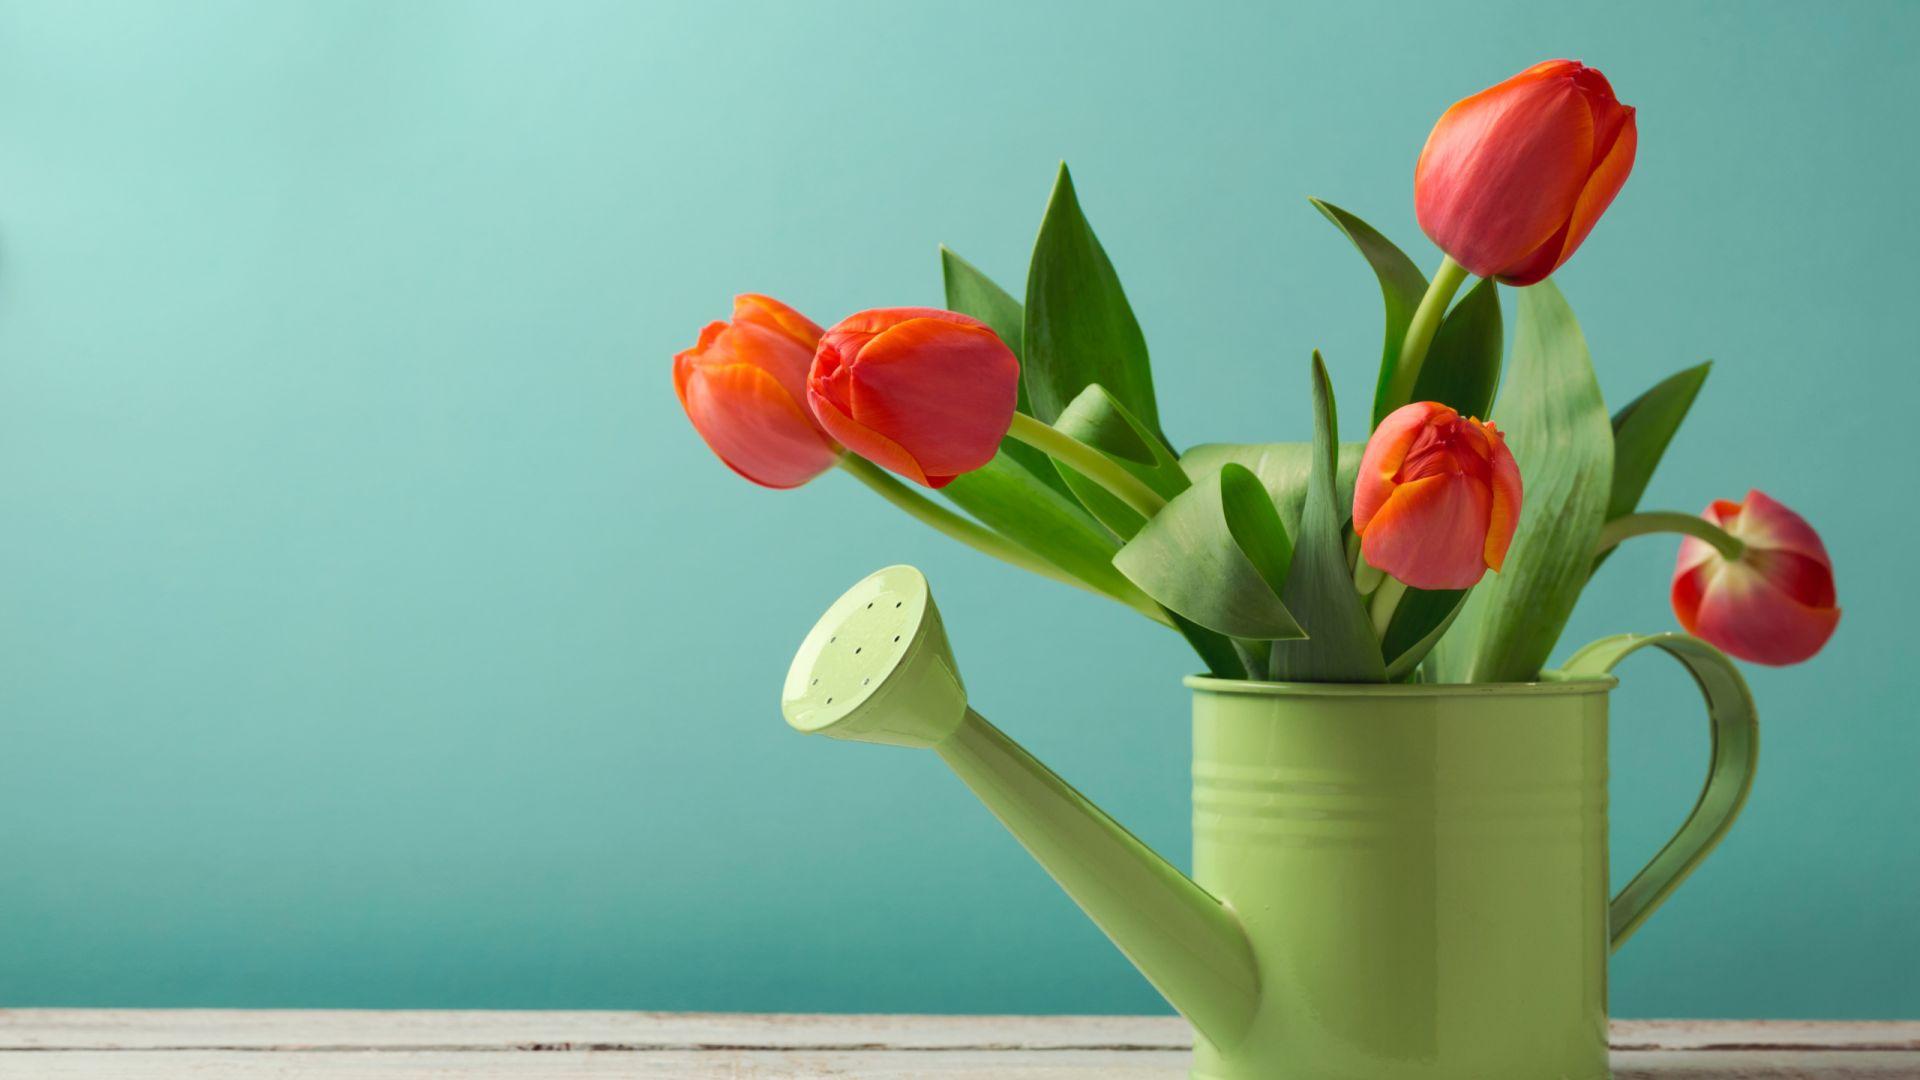 Iphone 6 Orange Flower Wallpaper Desktop Wallpaper Orange Tulips Plants Flower Pot Hd